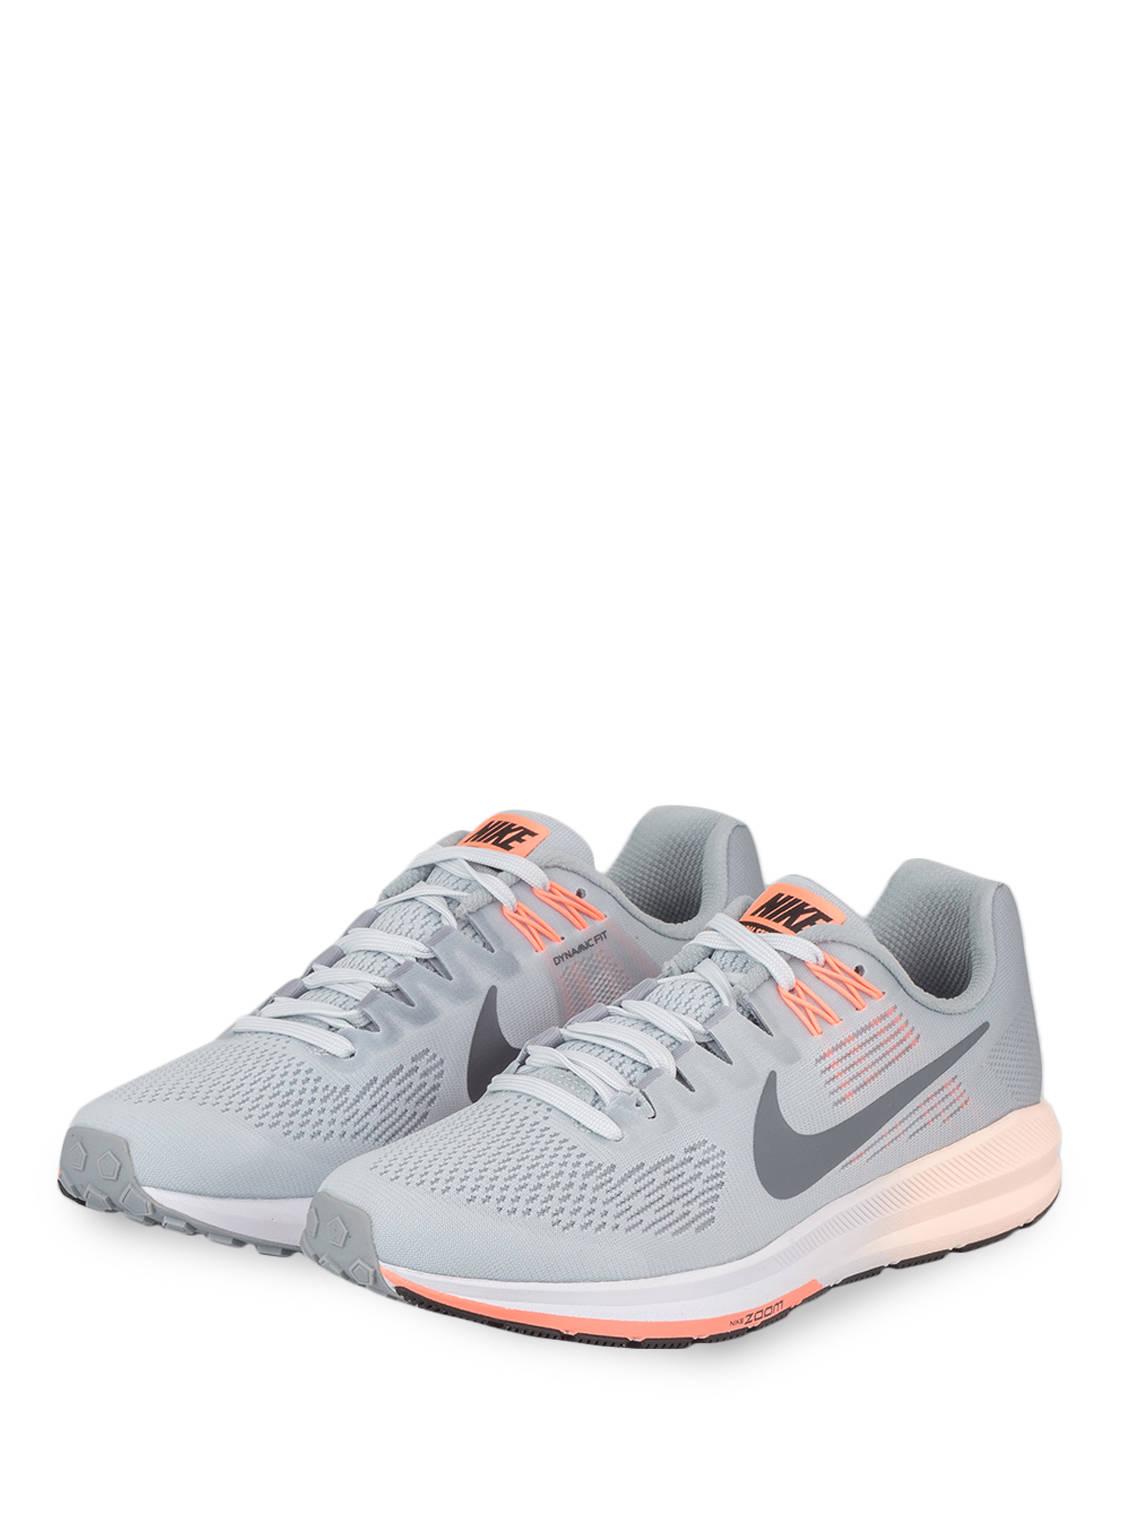 Nike Laufschuhe AIR ZOOM STRUCTURE 21